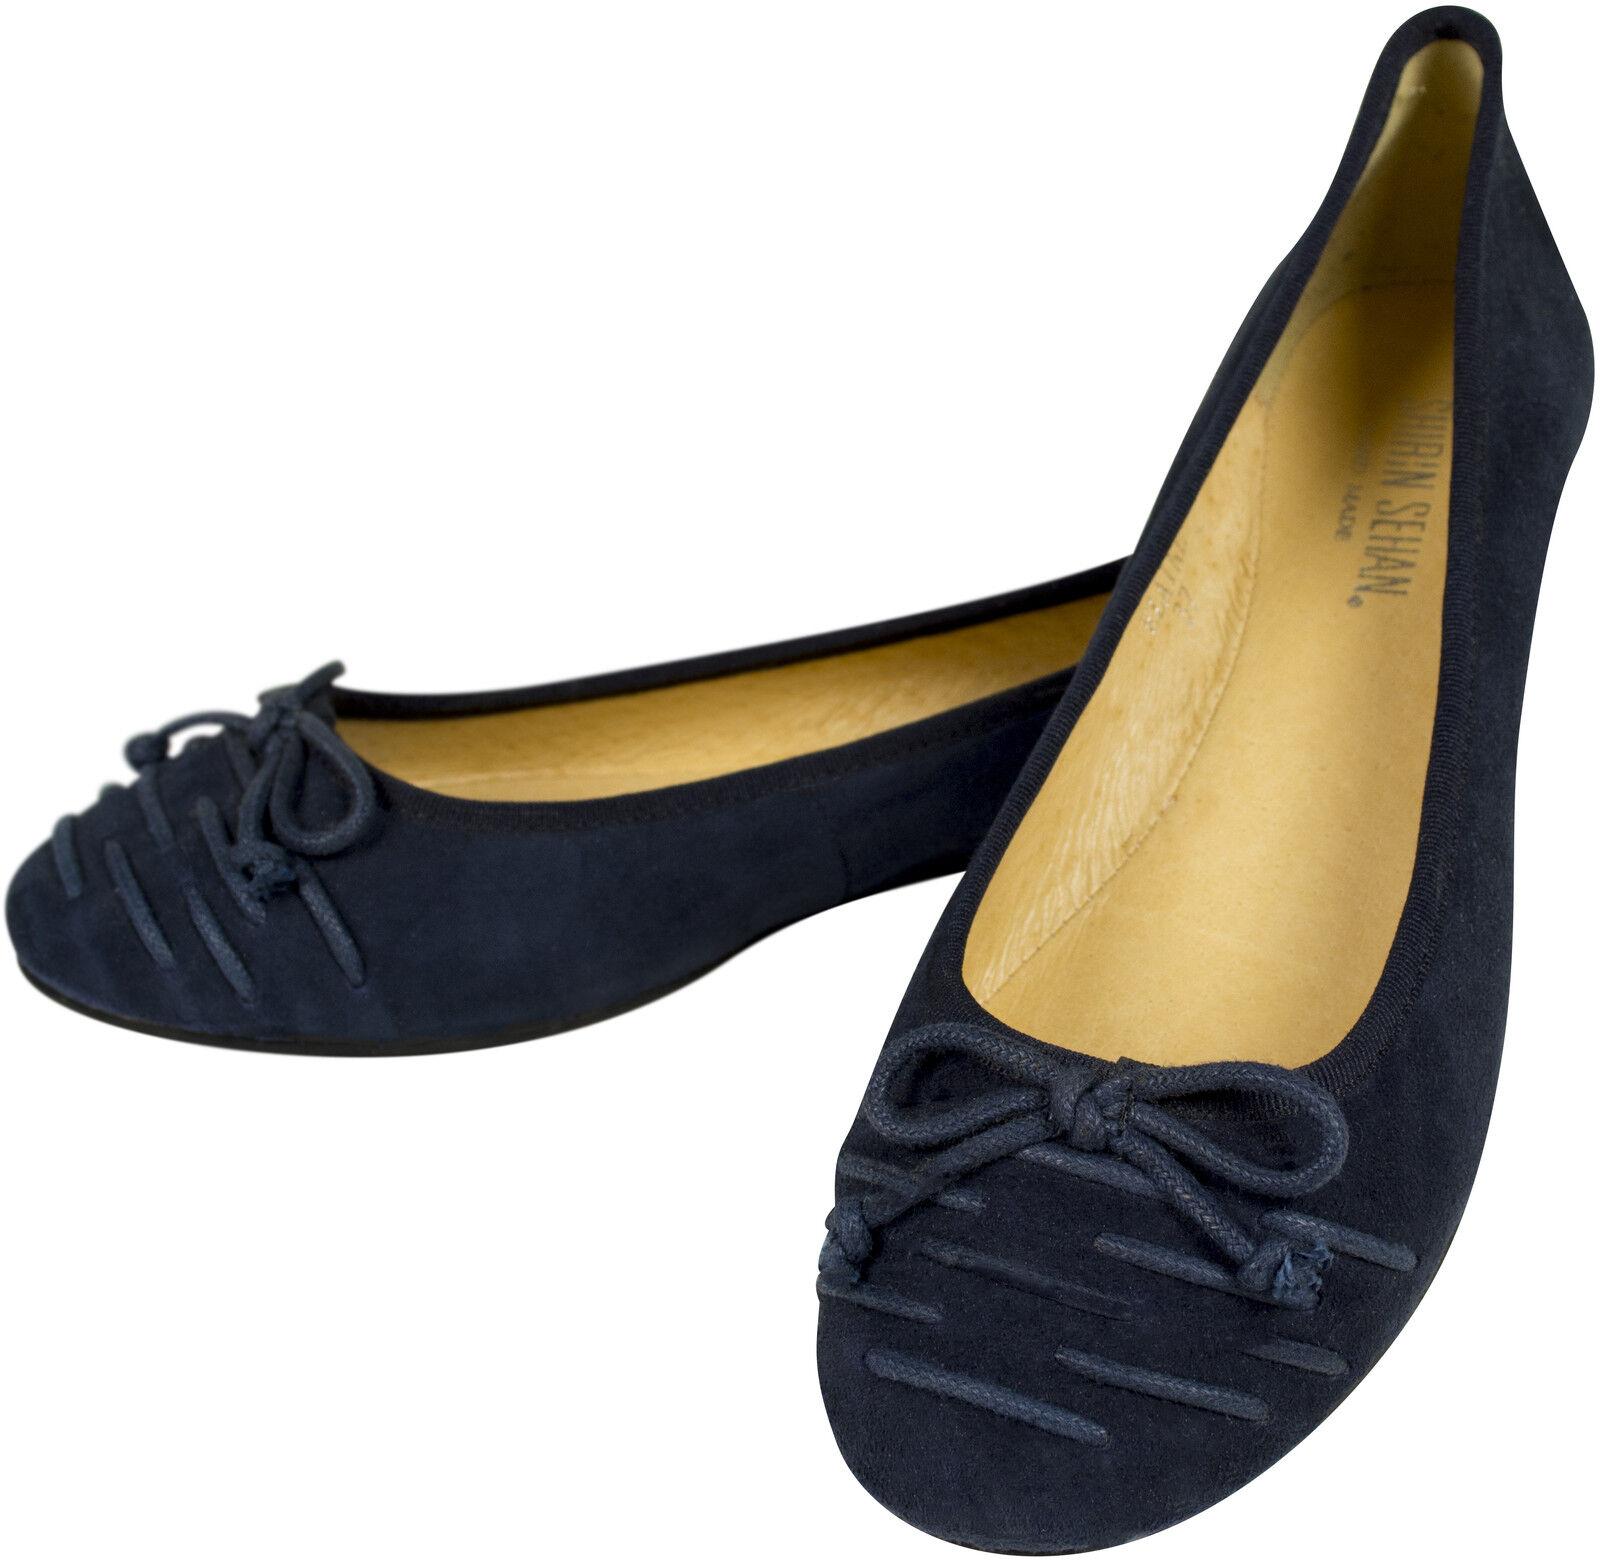 SUICOKE Den OG-088-NAVY Sandalo con Blue VARIE TAGLIE - NUOVO con Sandalo scatola 707095